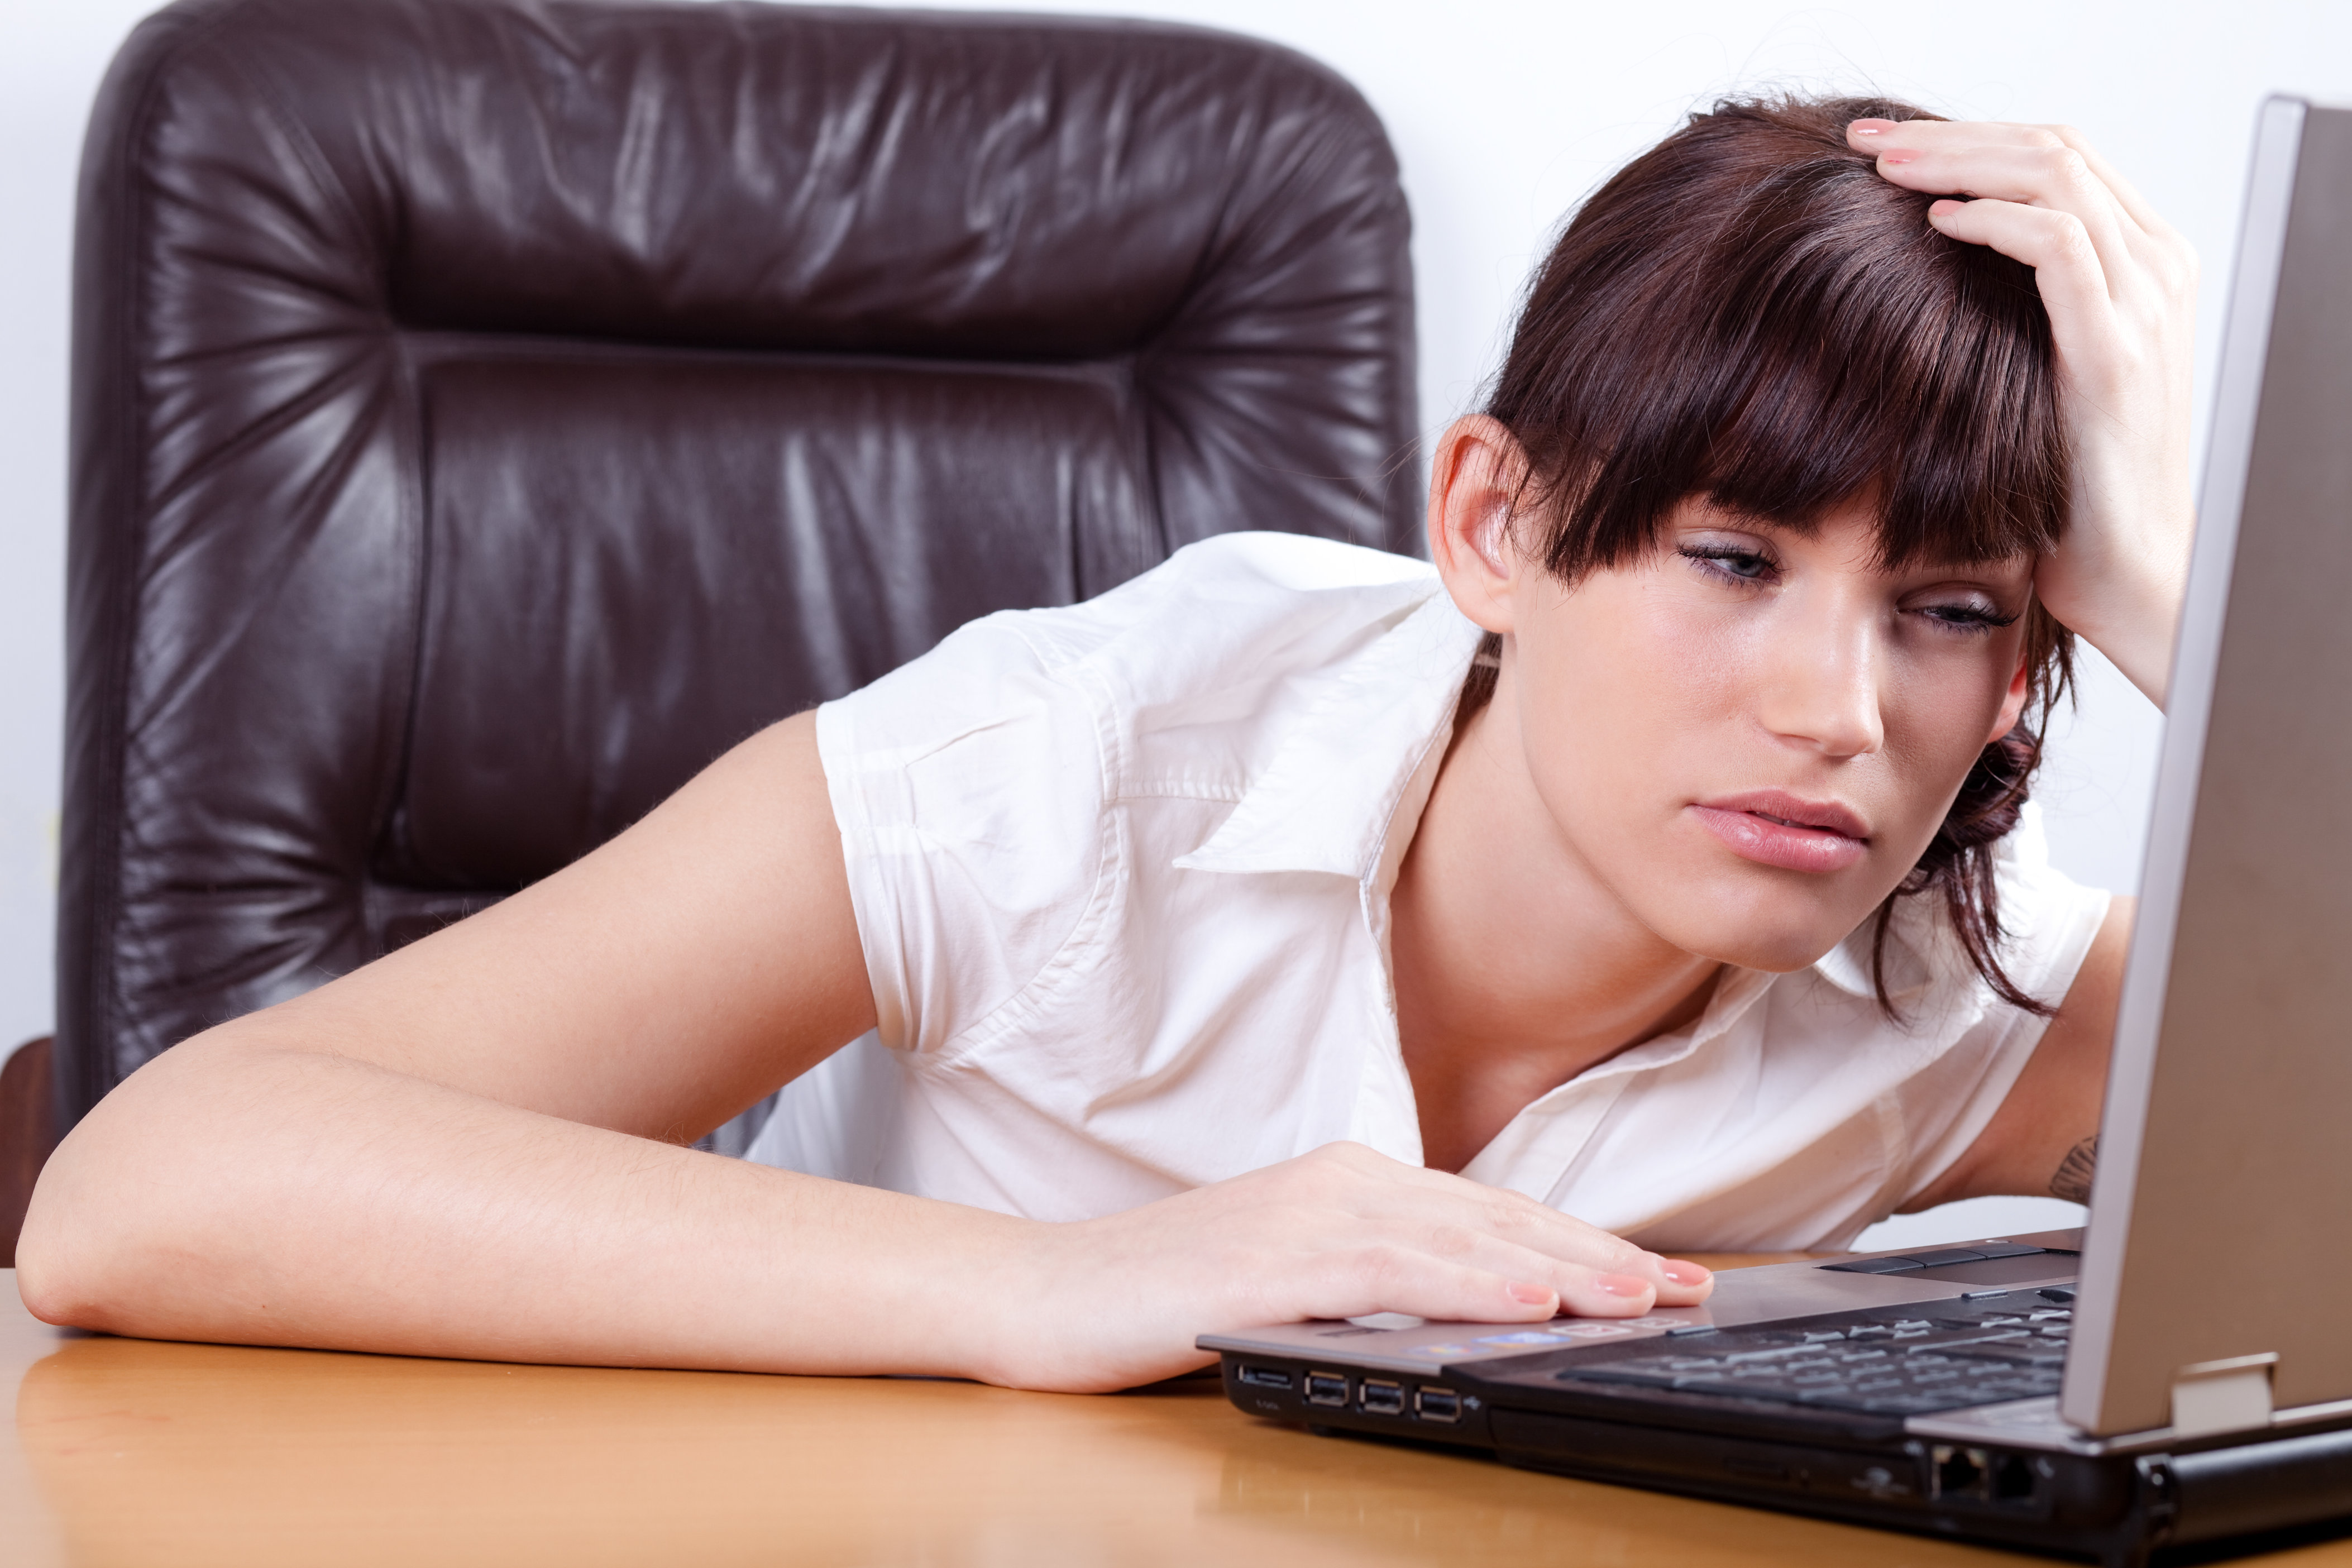 4. Lack of proper sleep minimises your work efficiency.